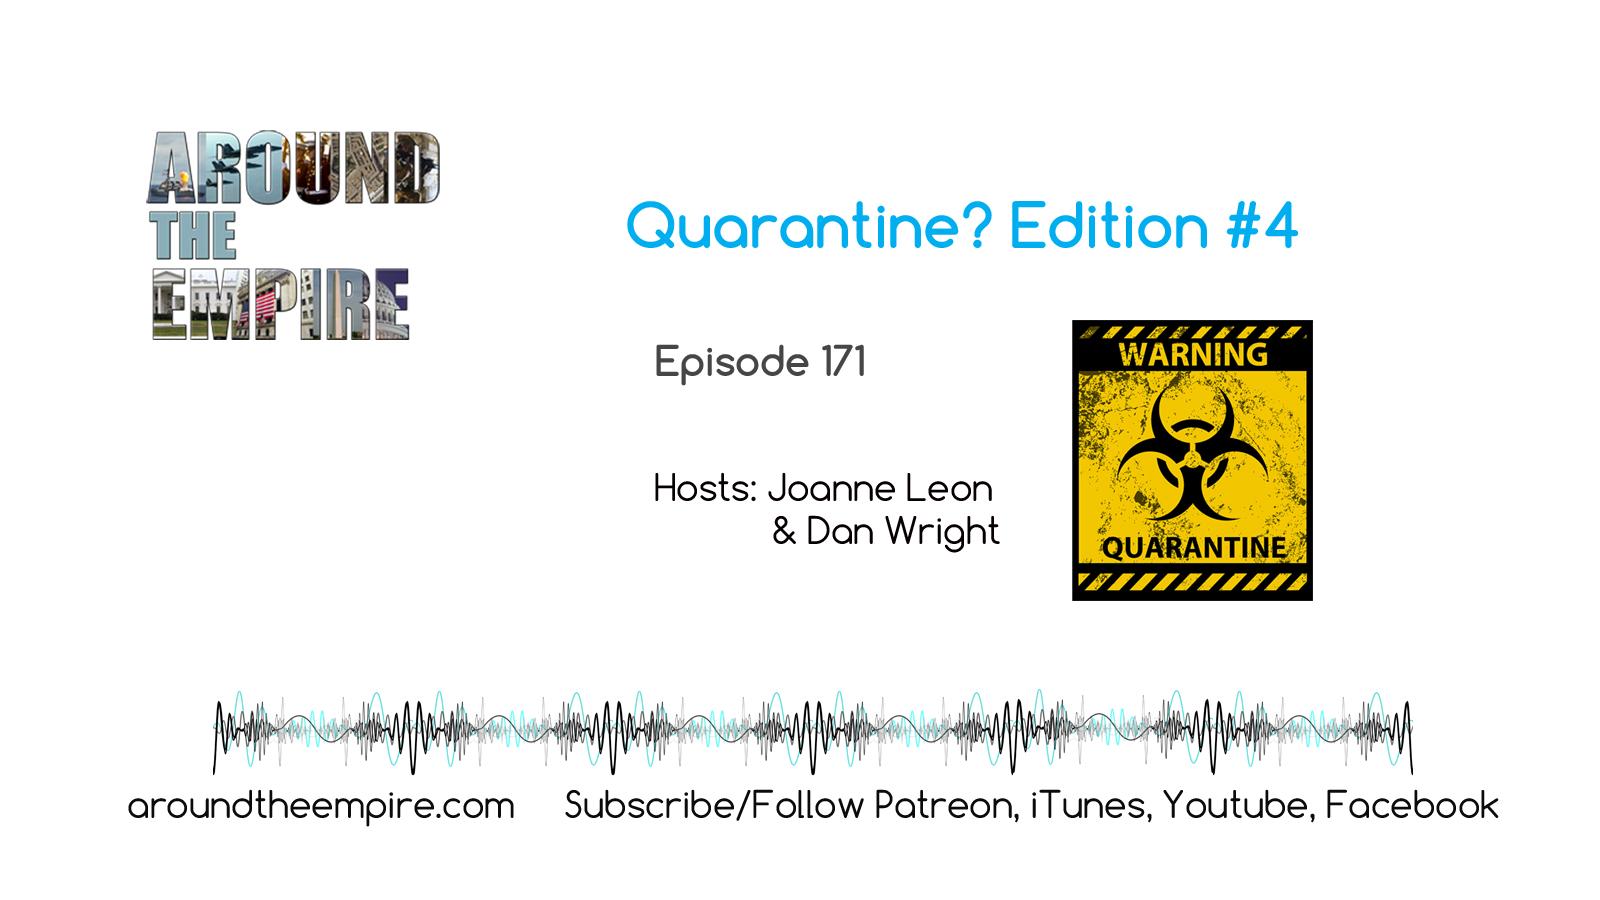 Ep 171 *UNLOCKED* Quarantine? Edition 4